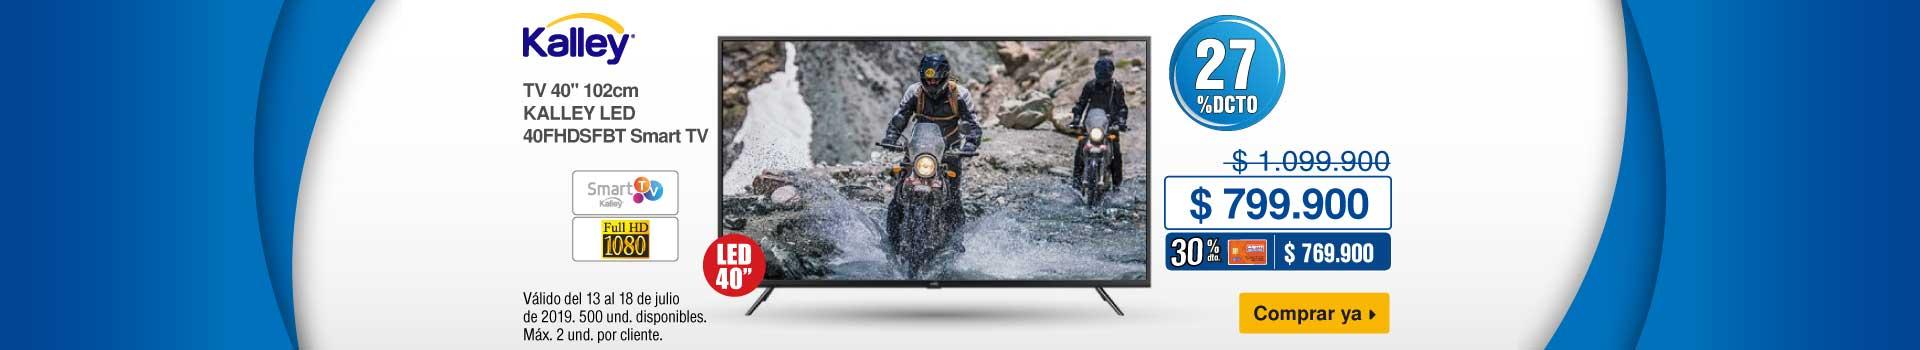 AK-KT-TV-KALLEY-40FHDSFBTIn-Categoria_Televisores1-13JUL